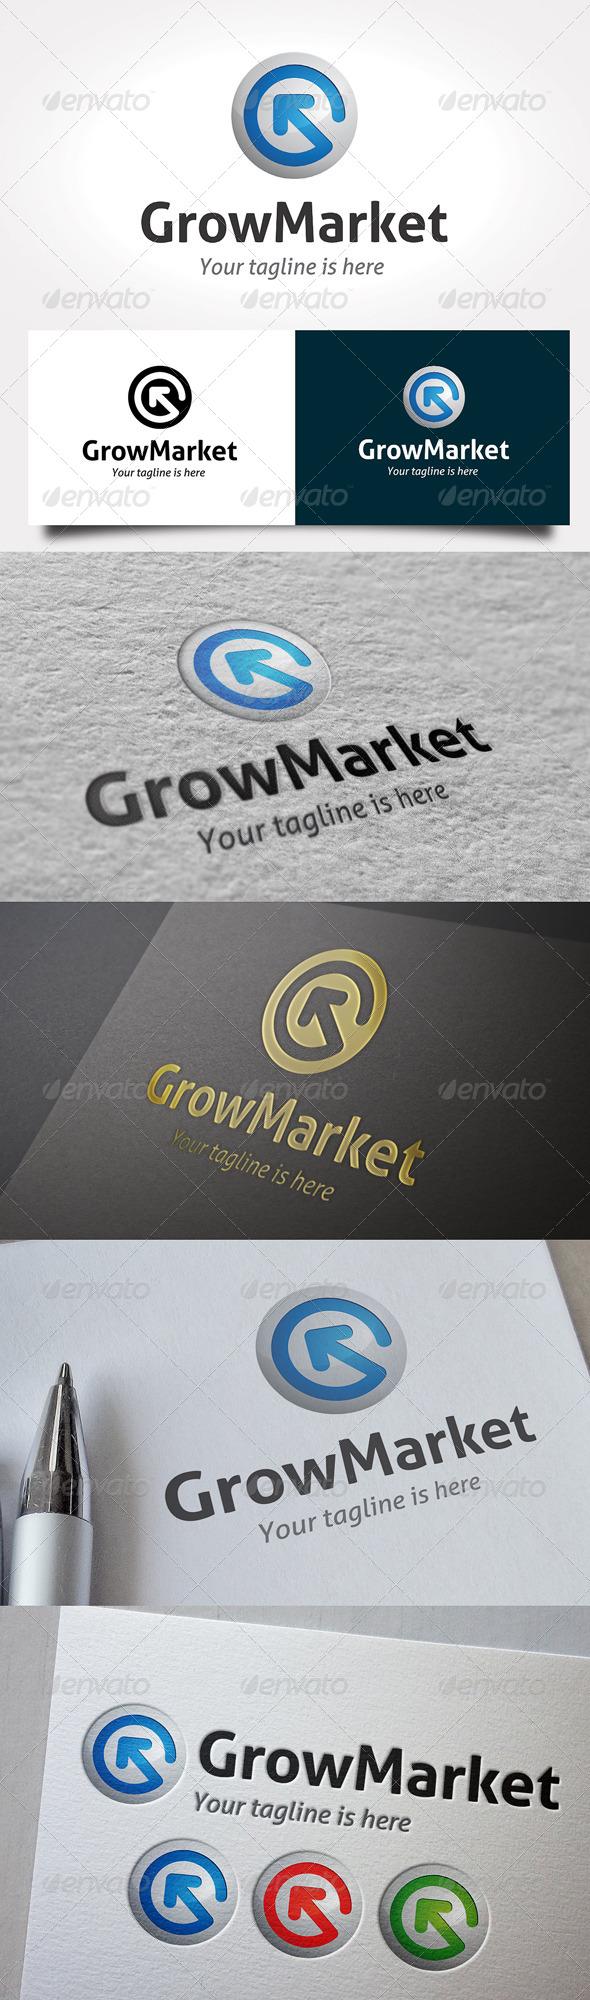 Grow Market Logo - Symbols Logo Templates